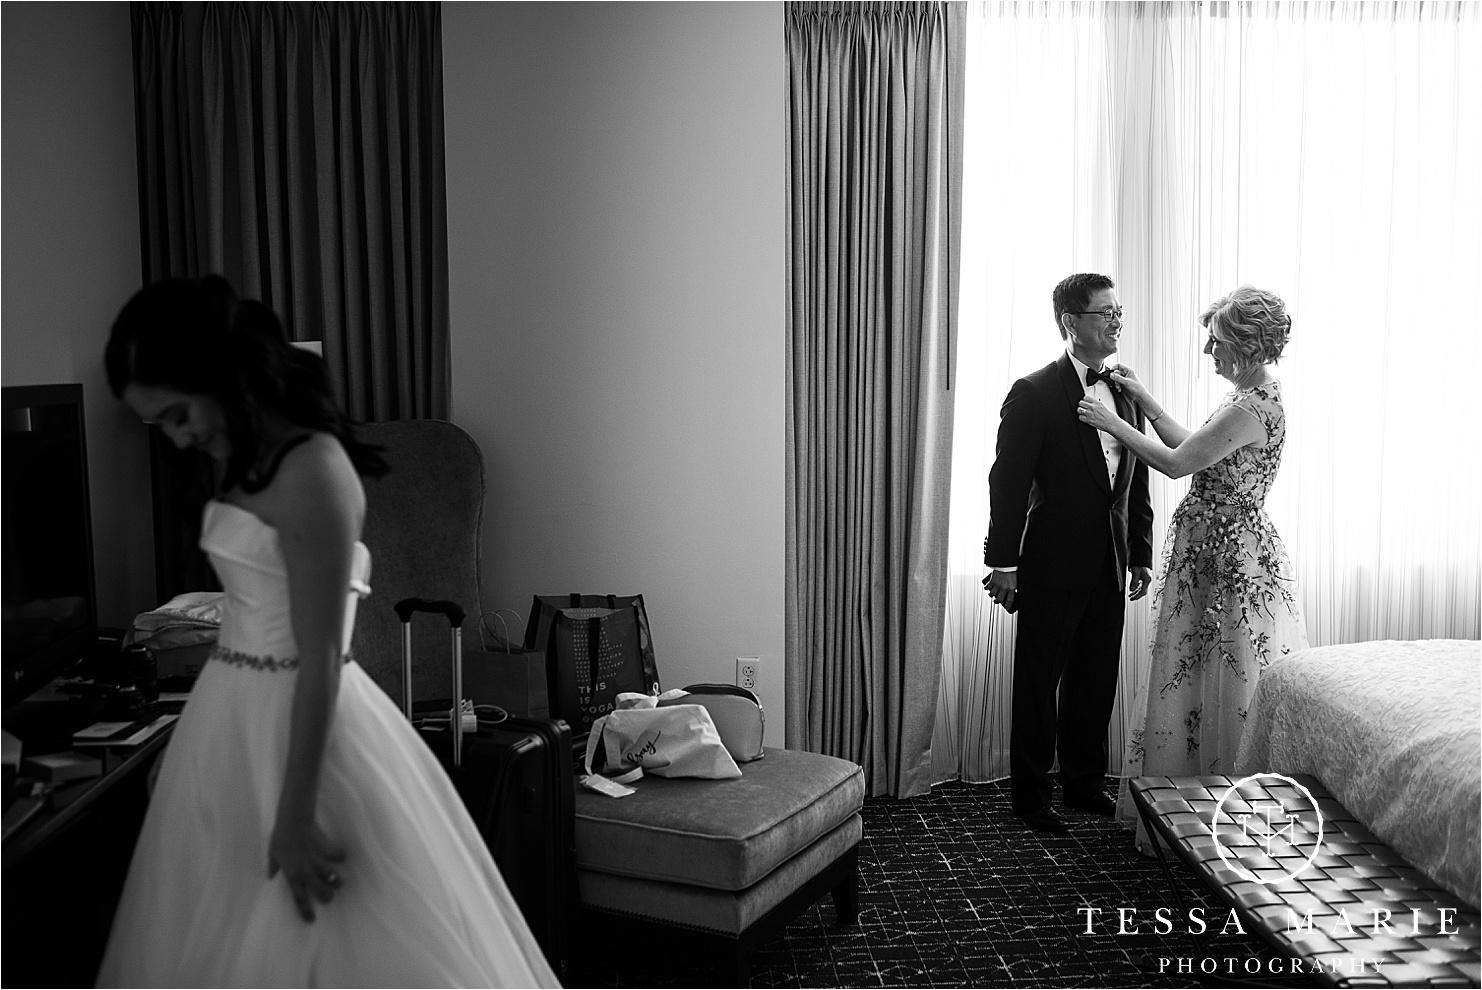 Tessa_marie_weddings_houston_wedding_photographer_The_astorian_0026.jpg